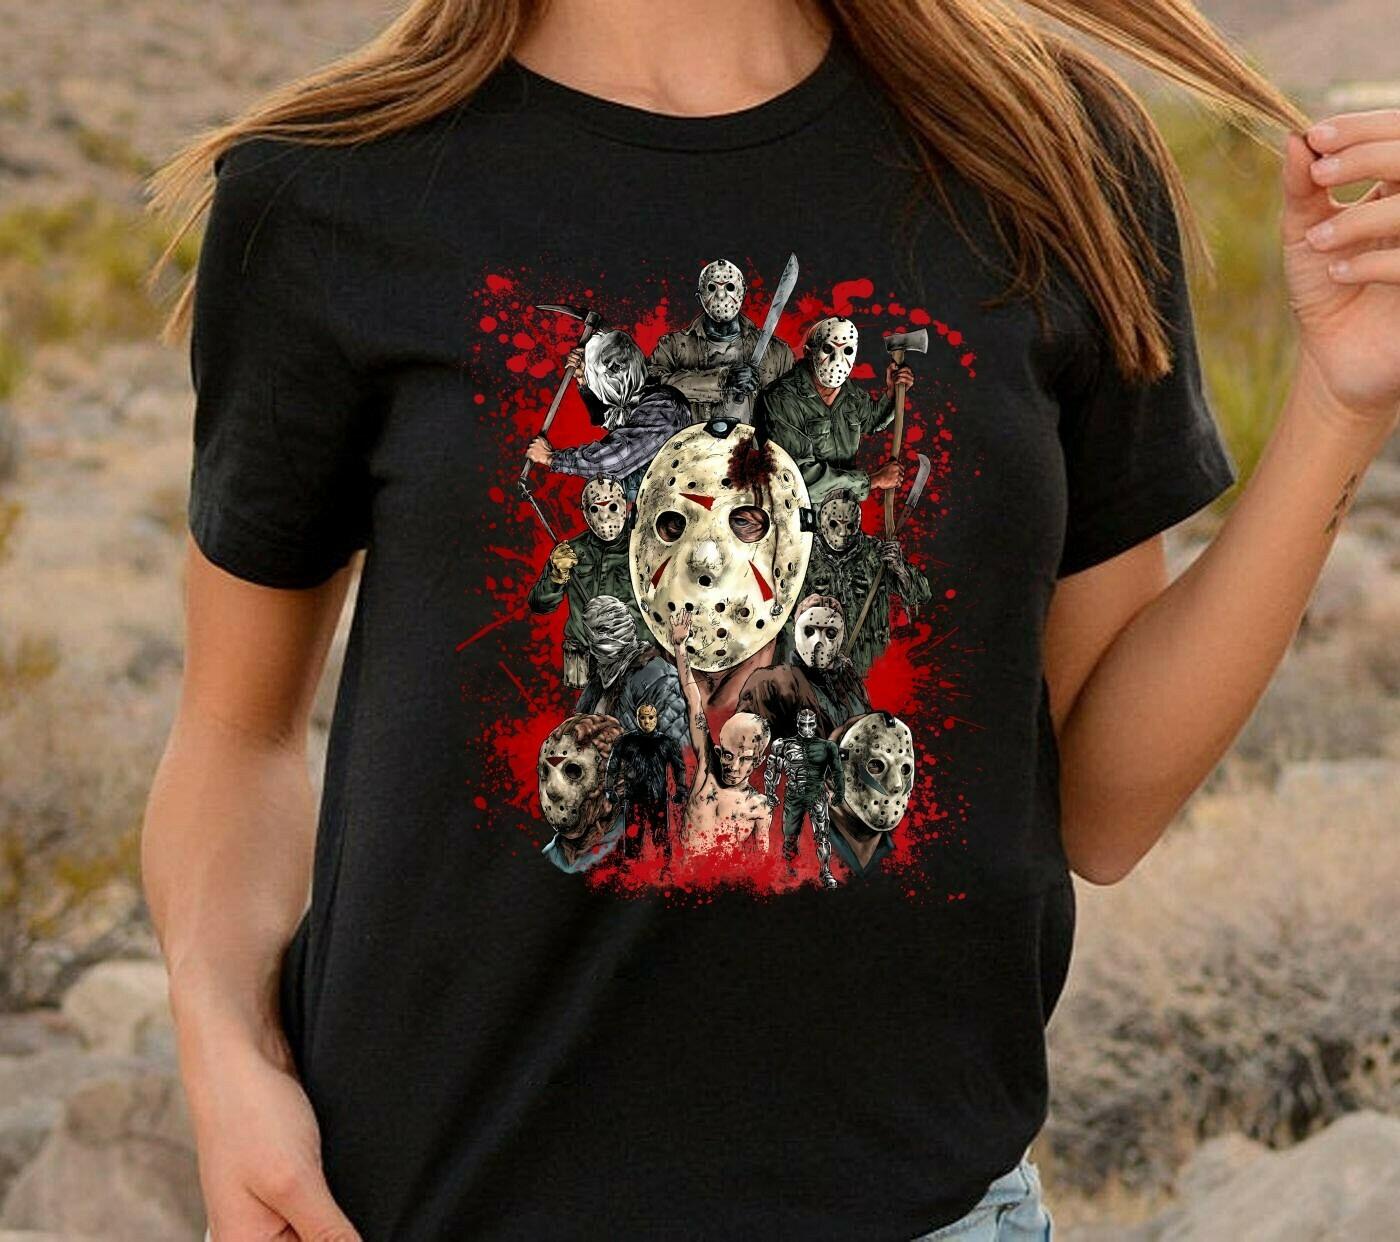 Horror Thriller Killer Jason Voorhees All Version Friday The 13th Movie Villains Halloween Horror Movie Mashup T-shirt Long Sleeve Sweatshirt Hoodie Jolly Family Gifts